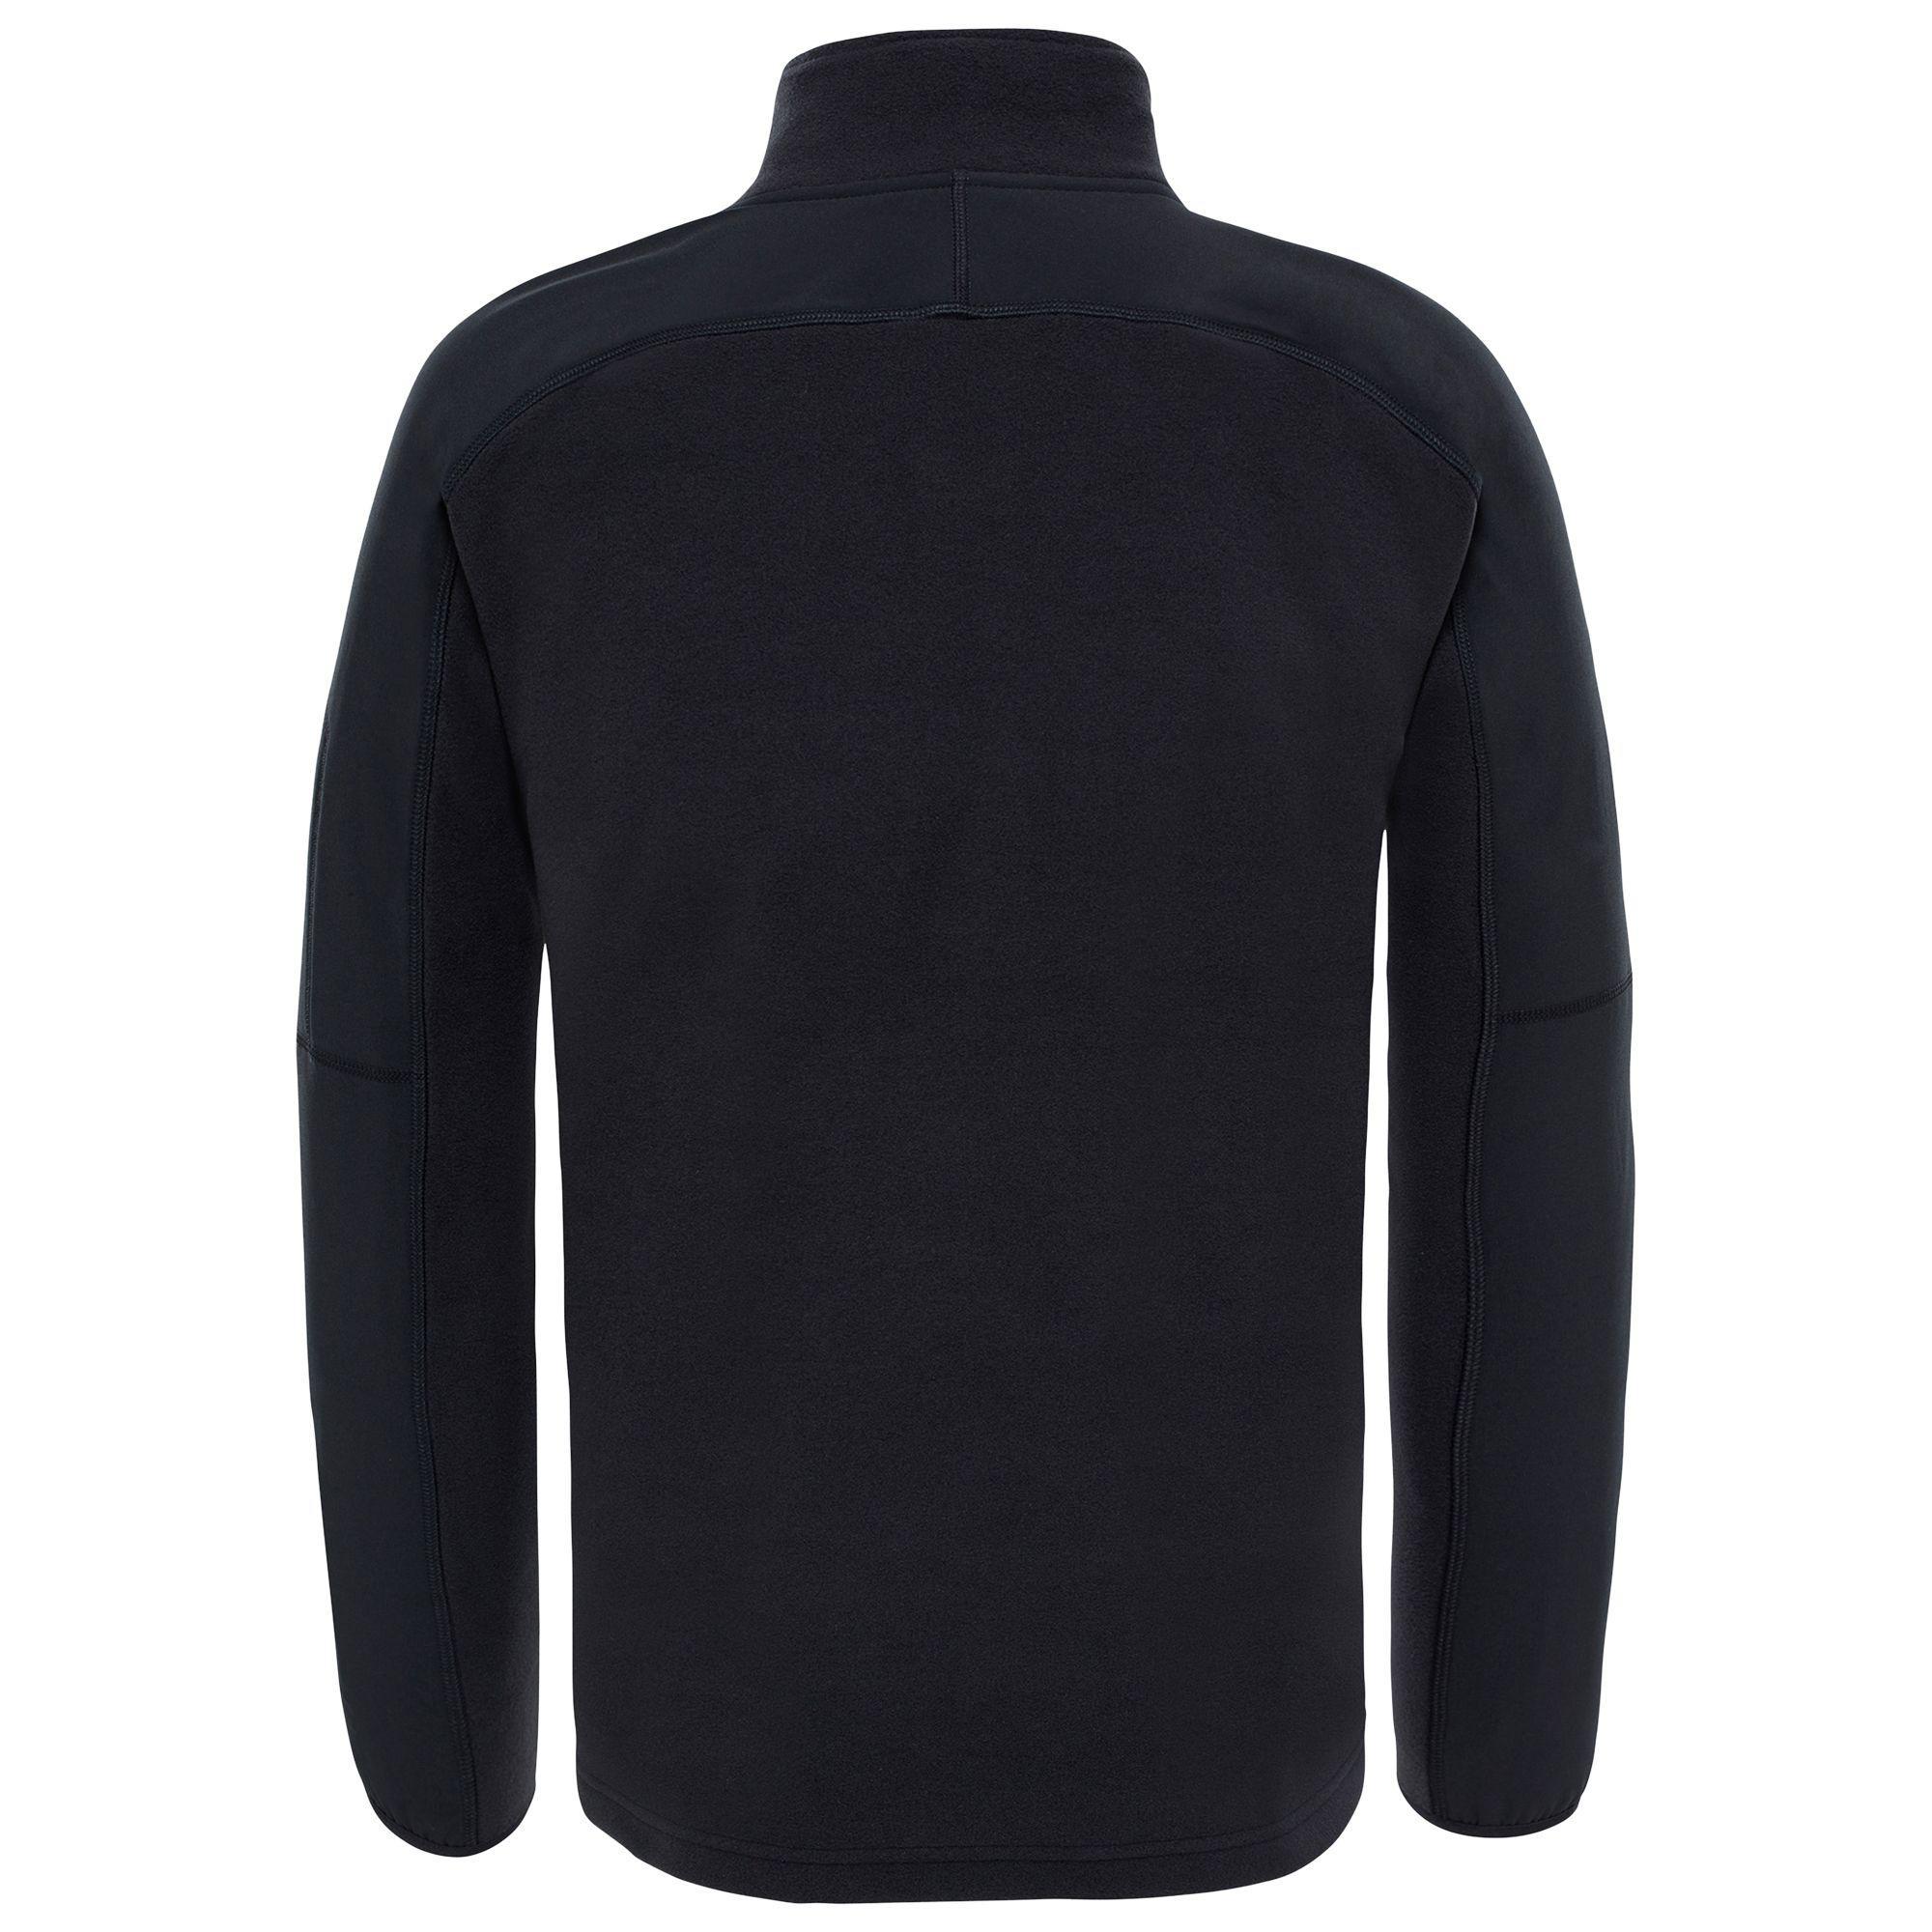 8b558996b The North Face Glacier Delta Quarter Zip Fleece in Black for Men - Lyst